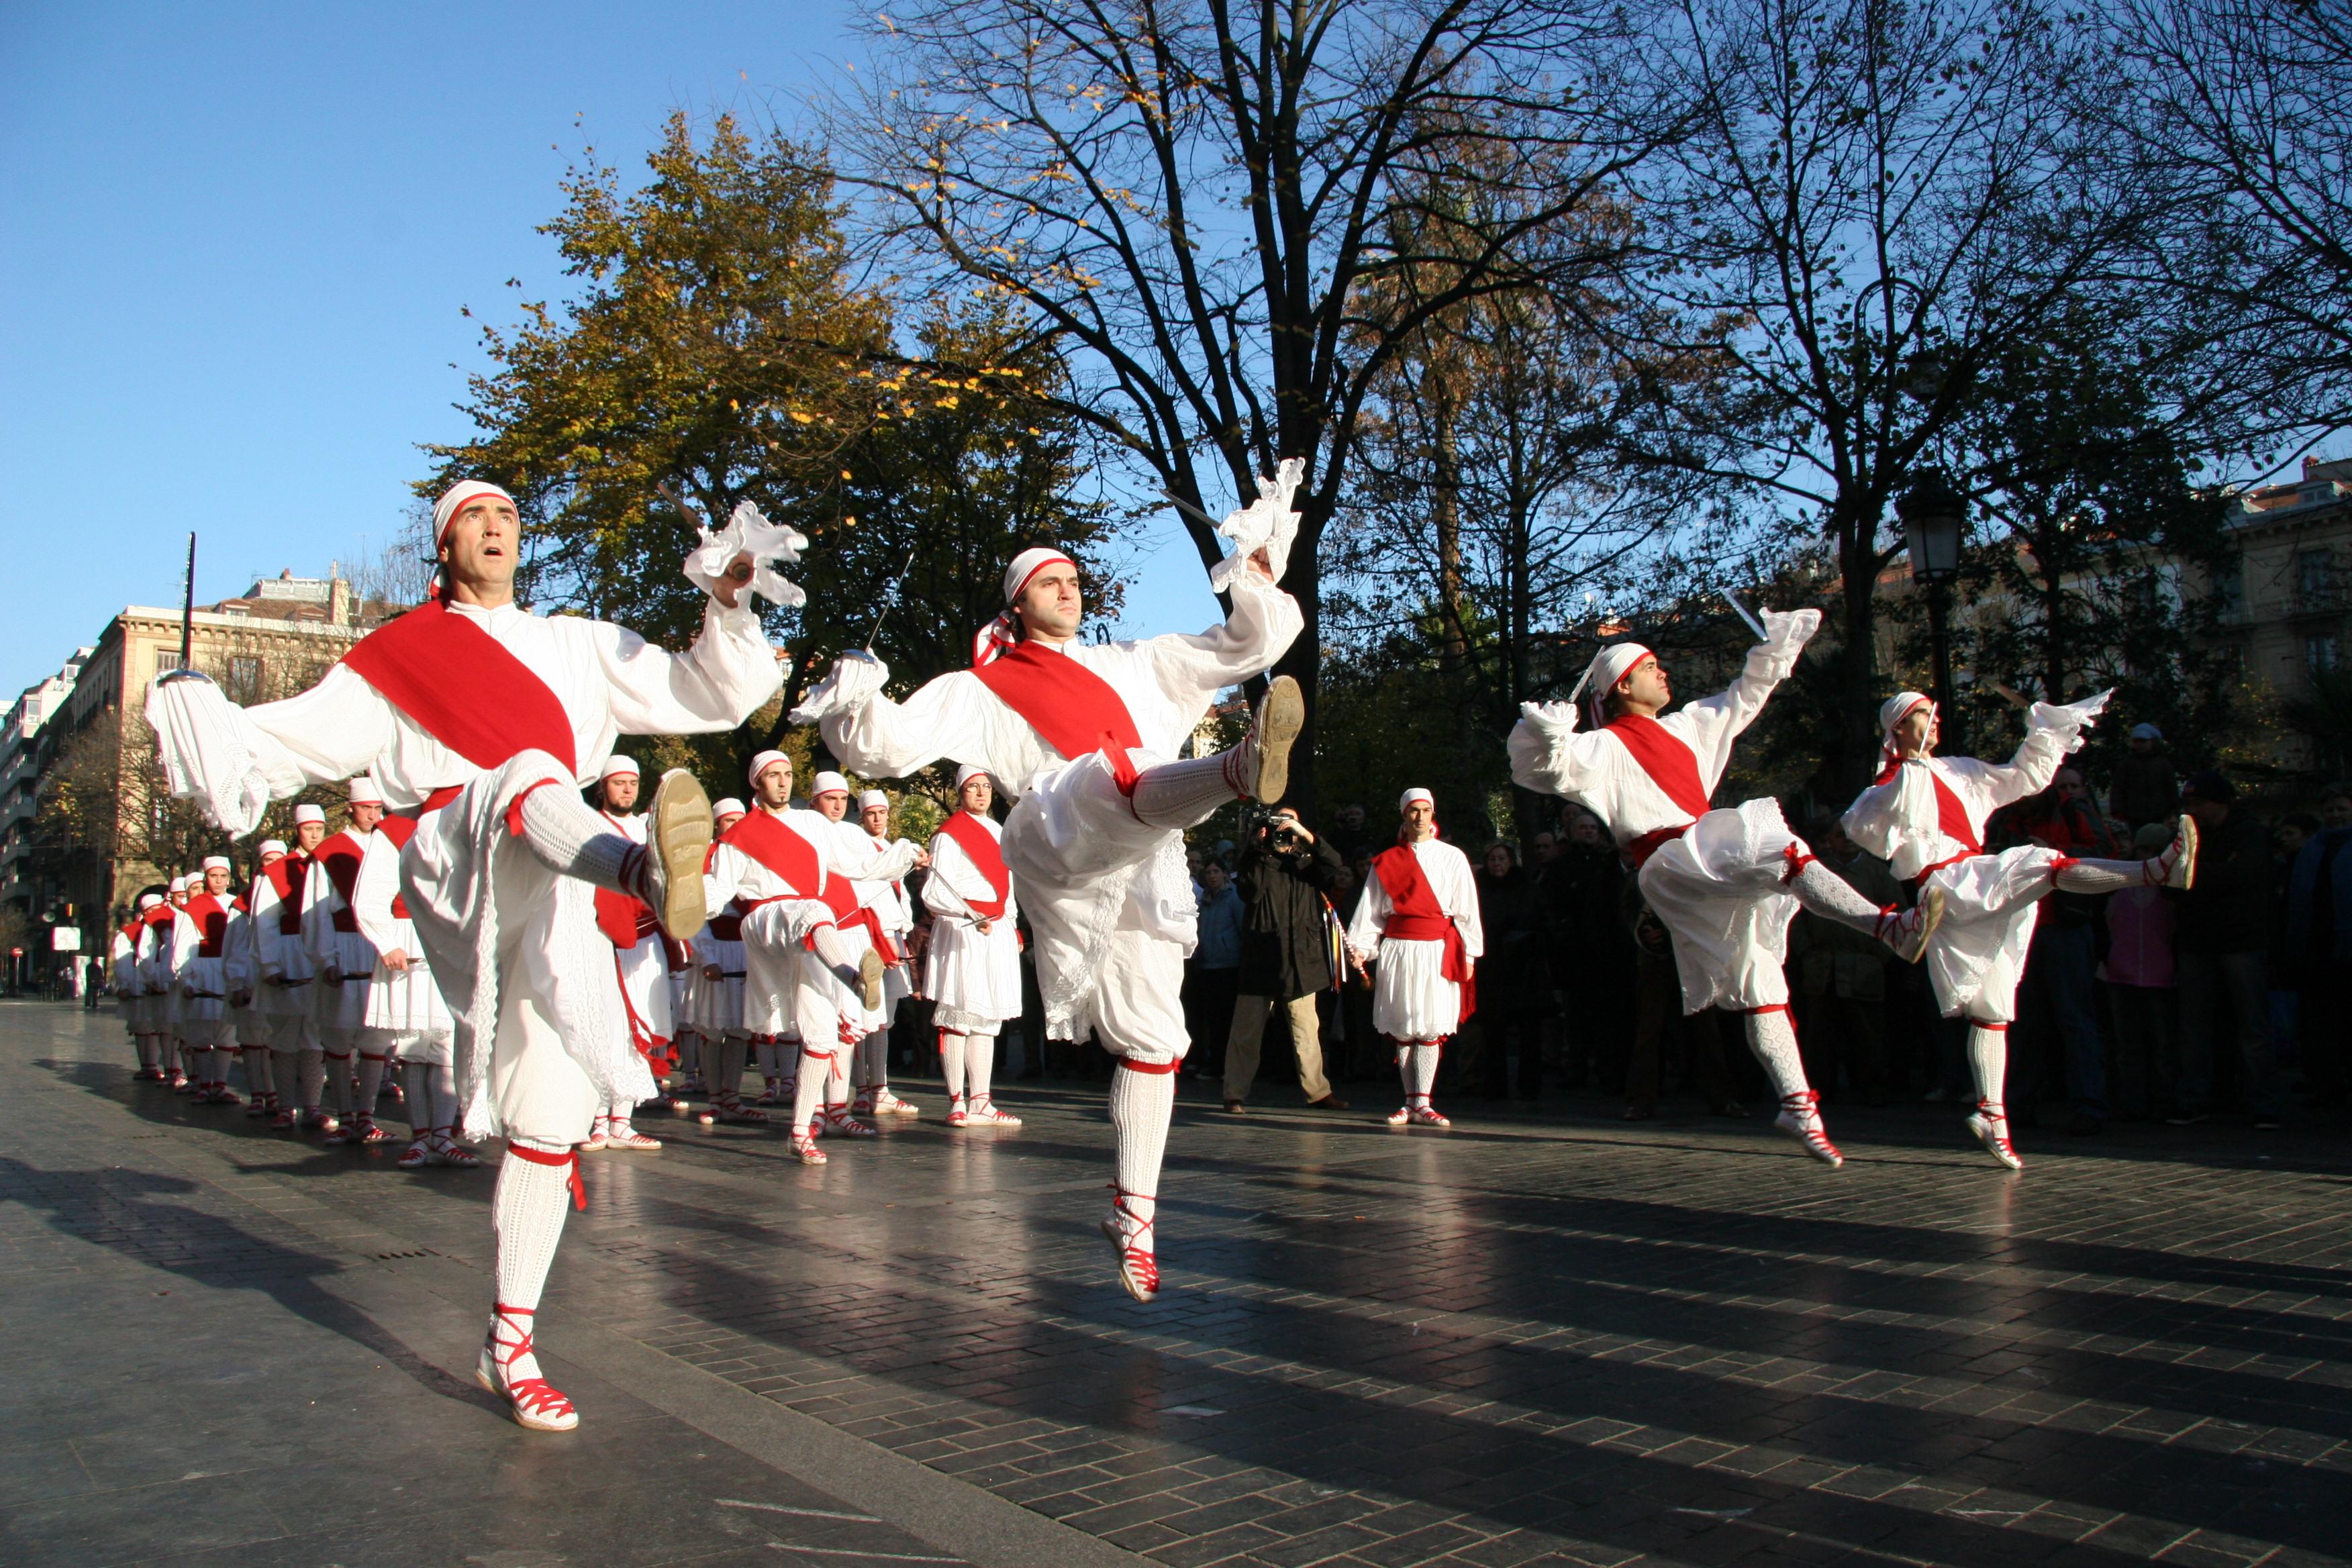 File:Basque dancers 01.jpg - Wikimedia Commons